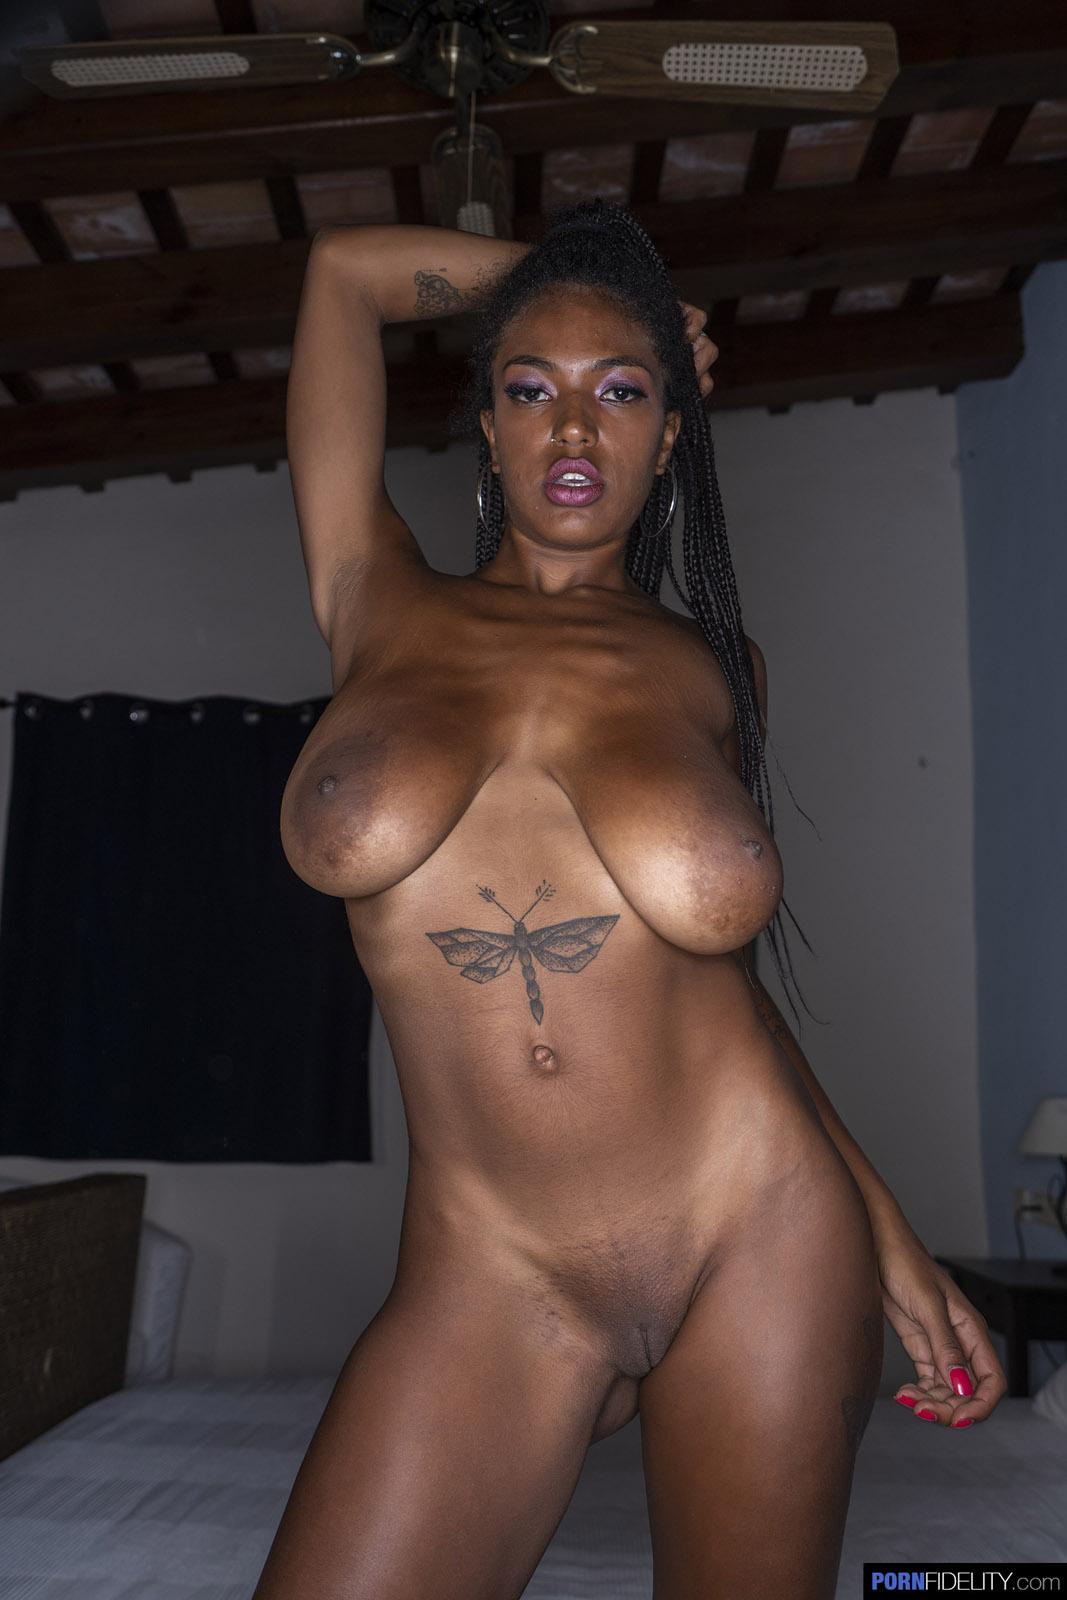 https://cdn.curvyerotic.com/wp-content/uploads/2020/09/tina-fire-shes-on-fire-pornfidelity-10.jpg